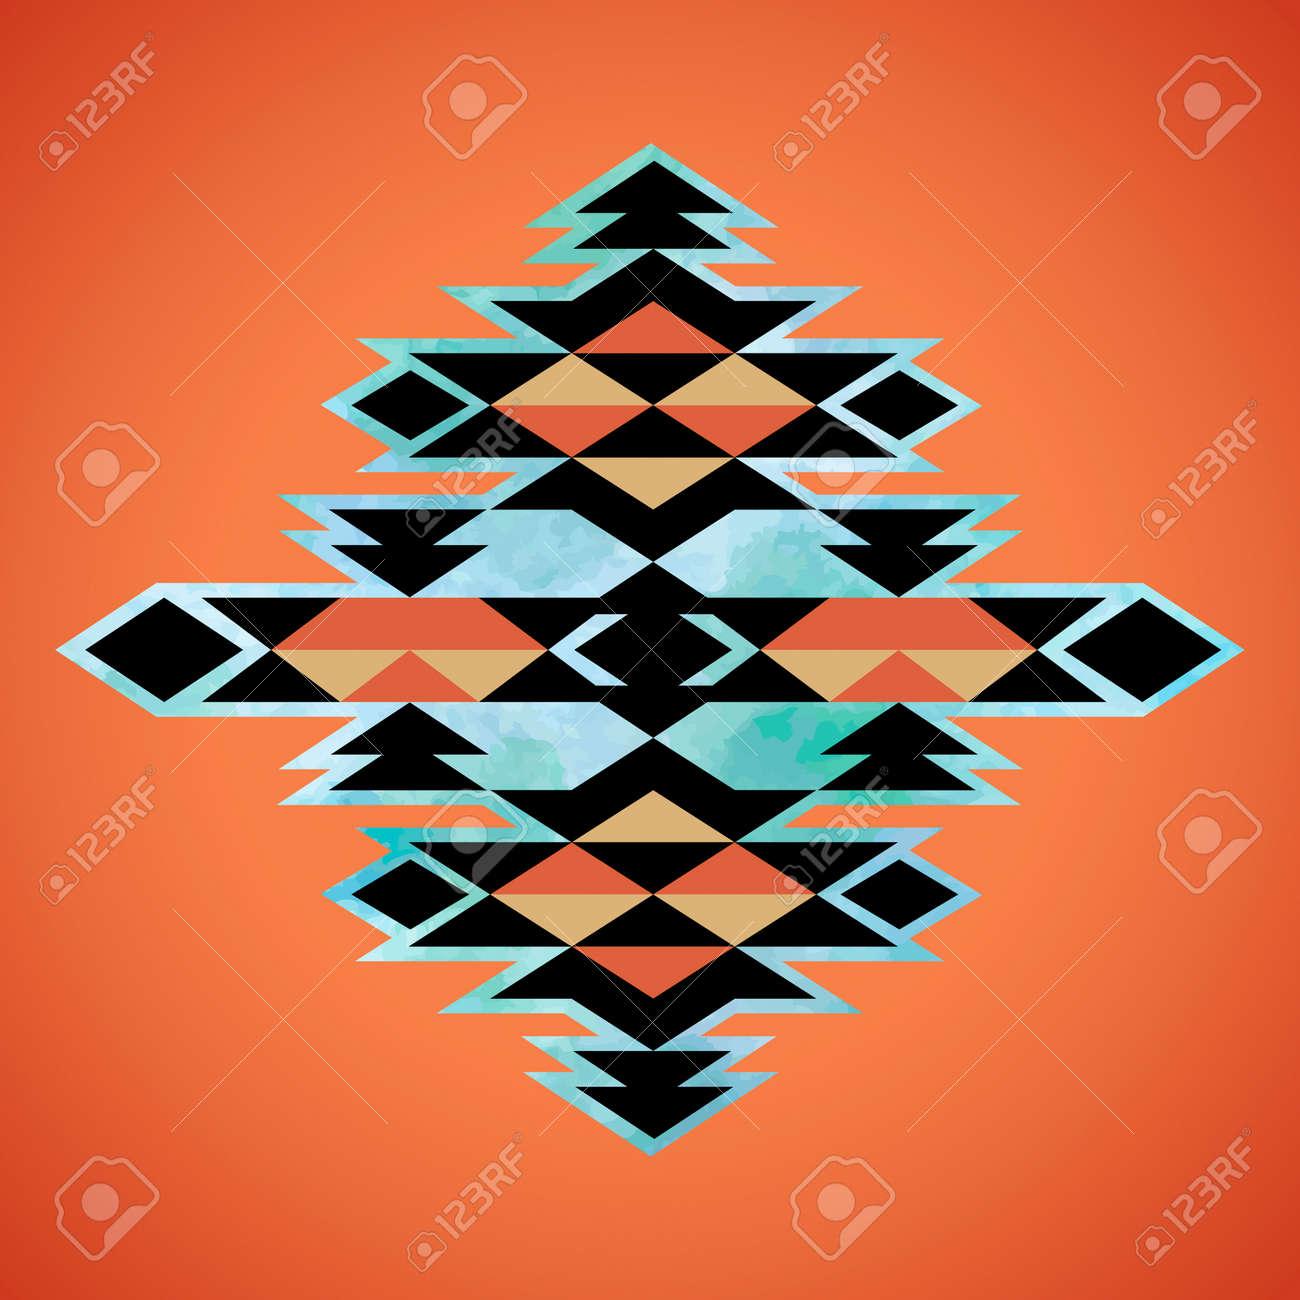 Navajo aztec textile inspiration pattern. Native american indian tribal hand drawn art. - 38669601